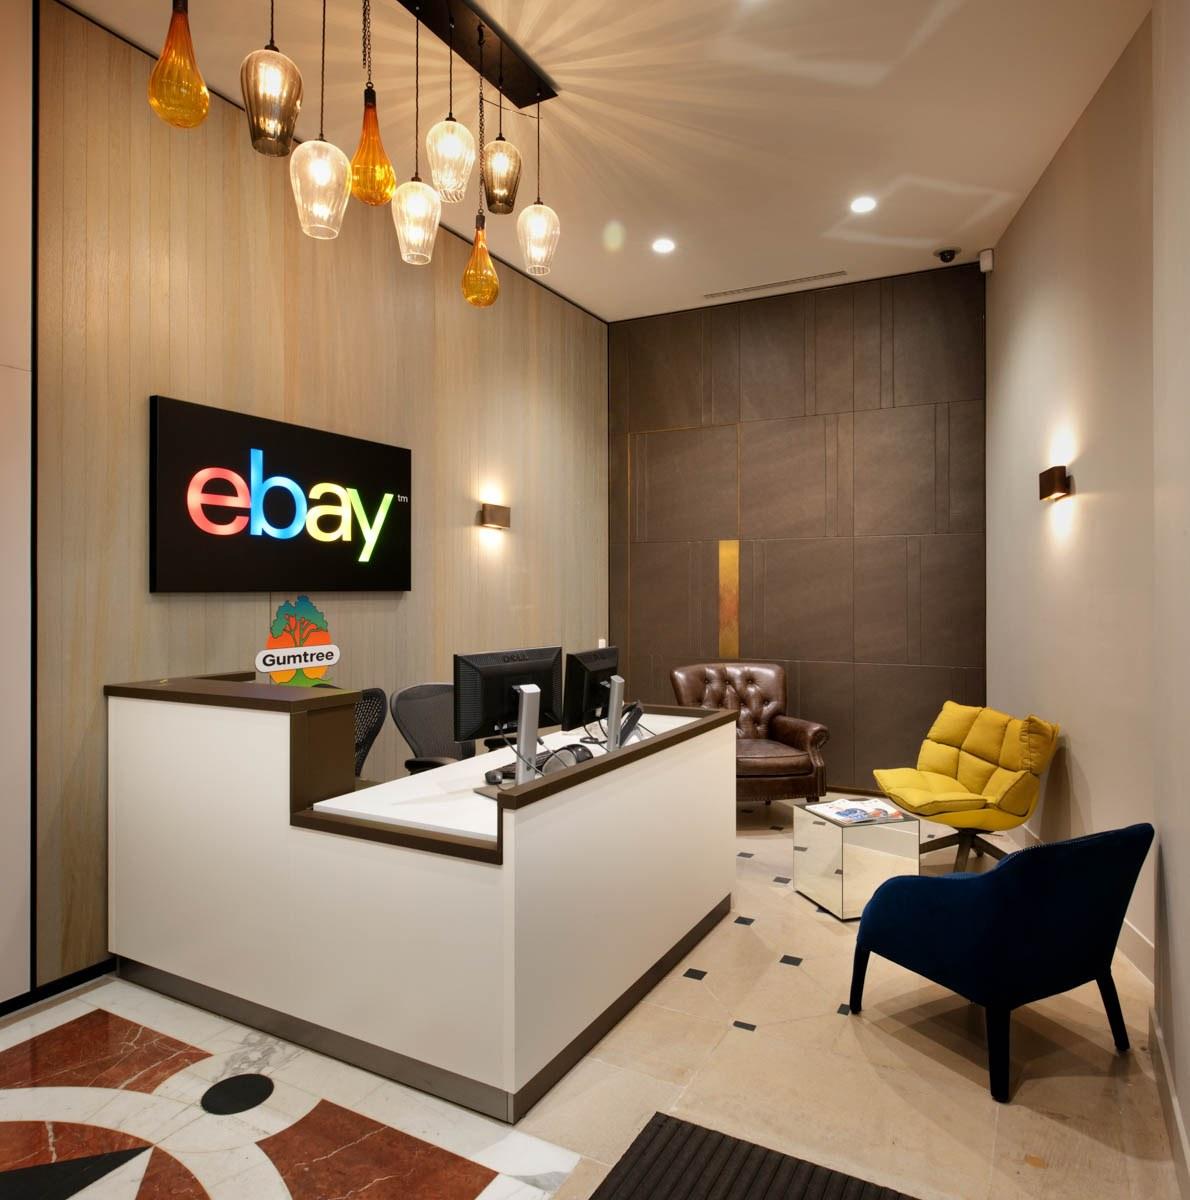 eBay reception biophilia design ideas